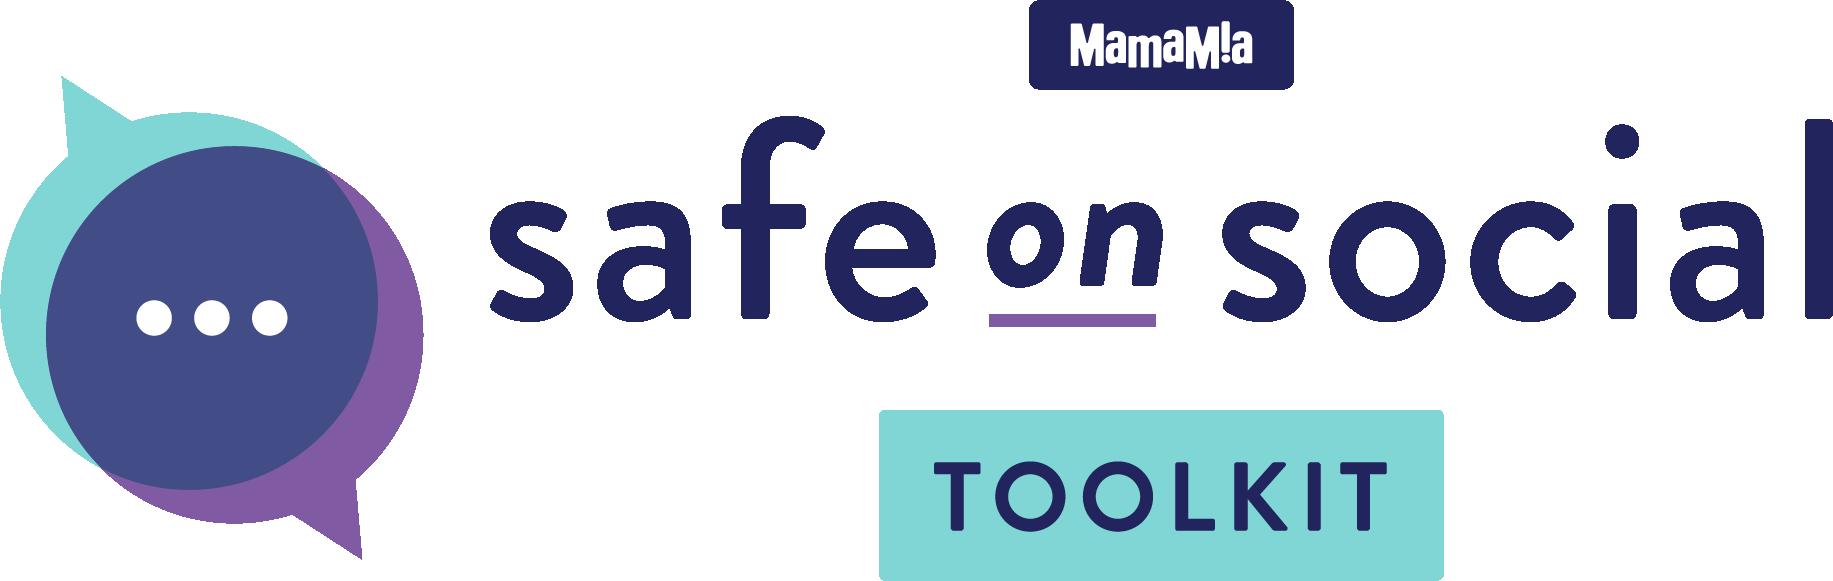 Safe on Social Toolkit